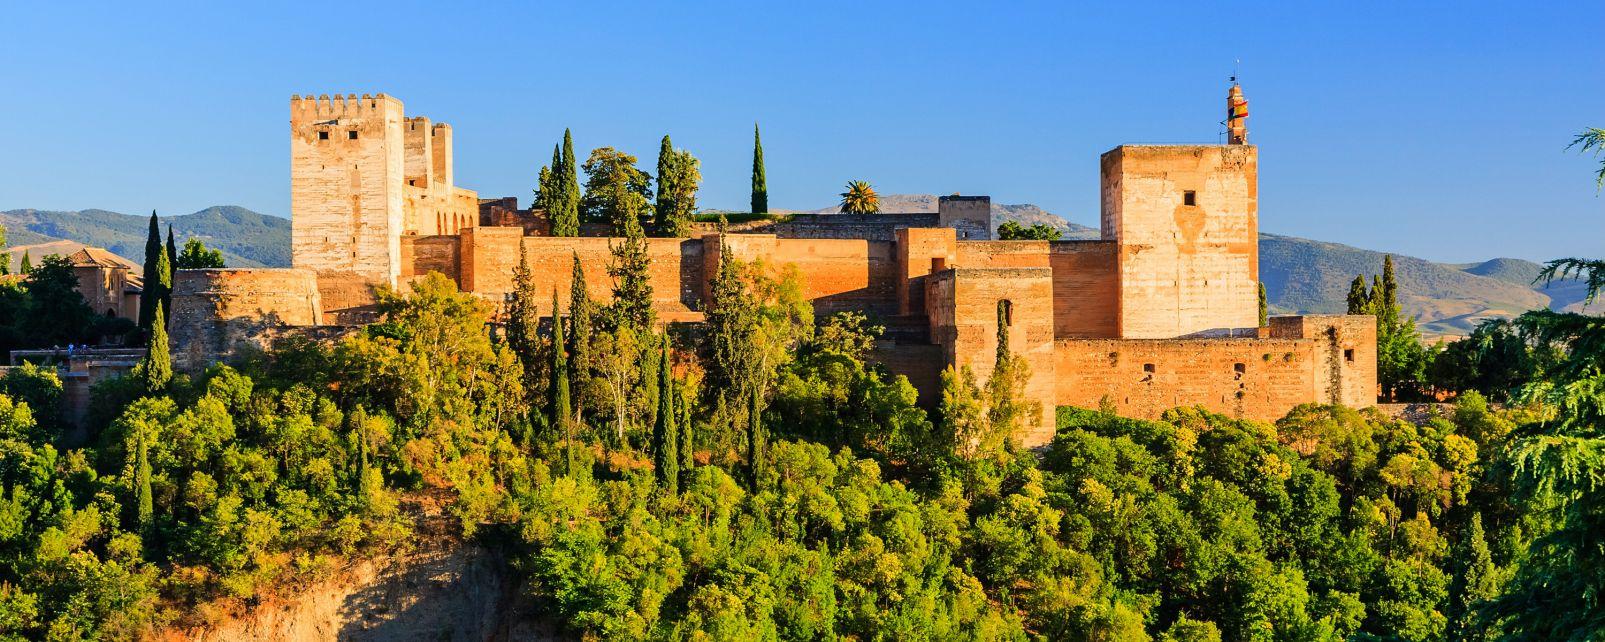 Les paysages, alhambra, grenade, andalousie, espagne, fort, europe, mauresque, citadelle